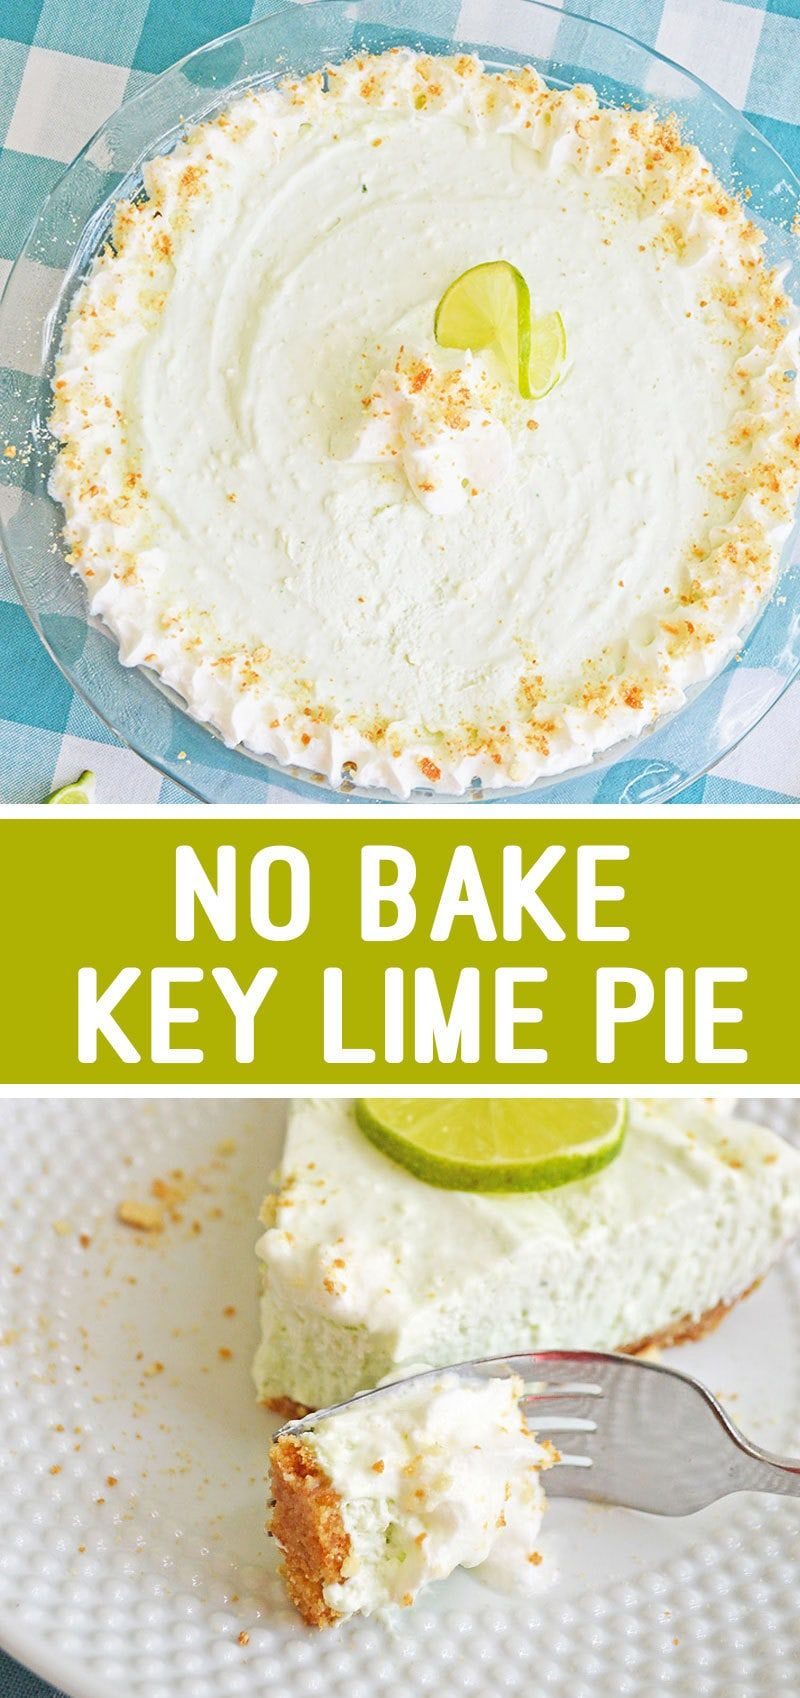 Gluten Free Recipes gluten free key lime pie